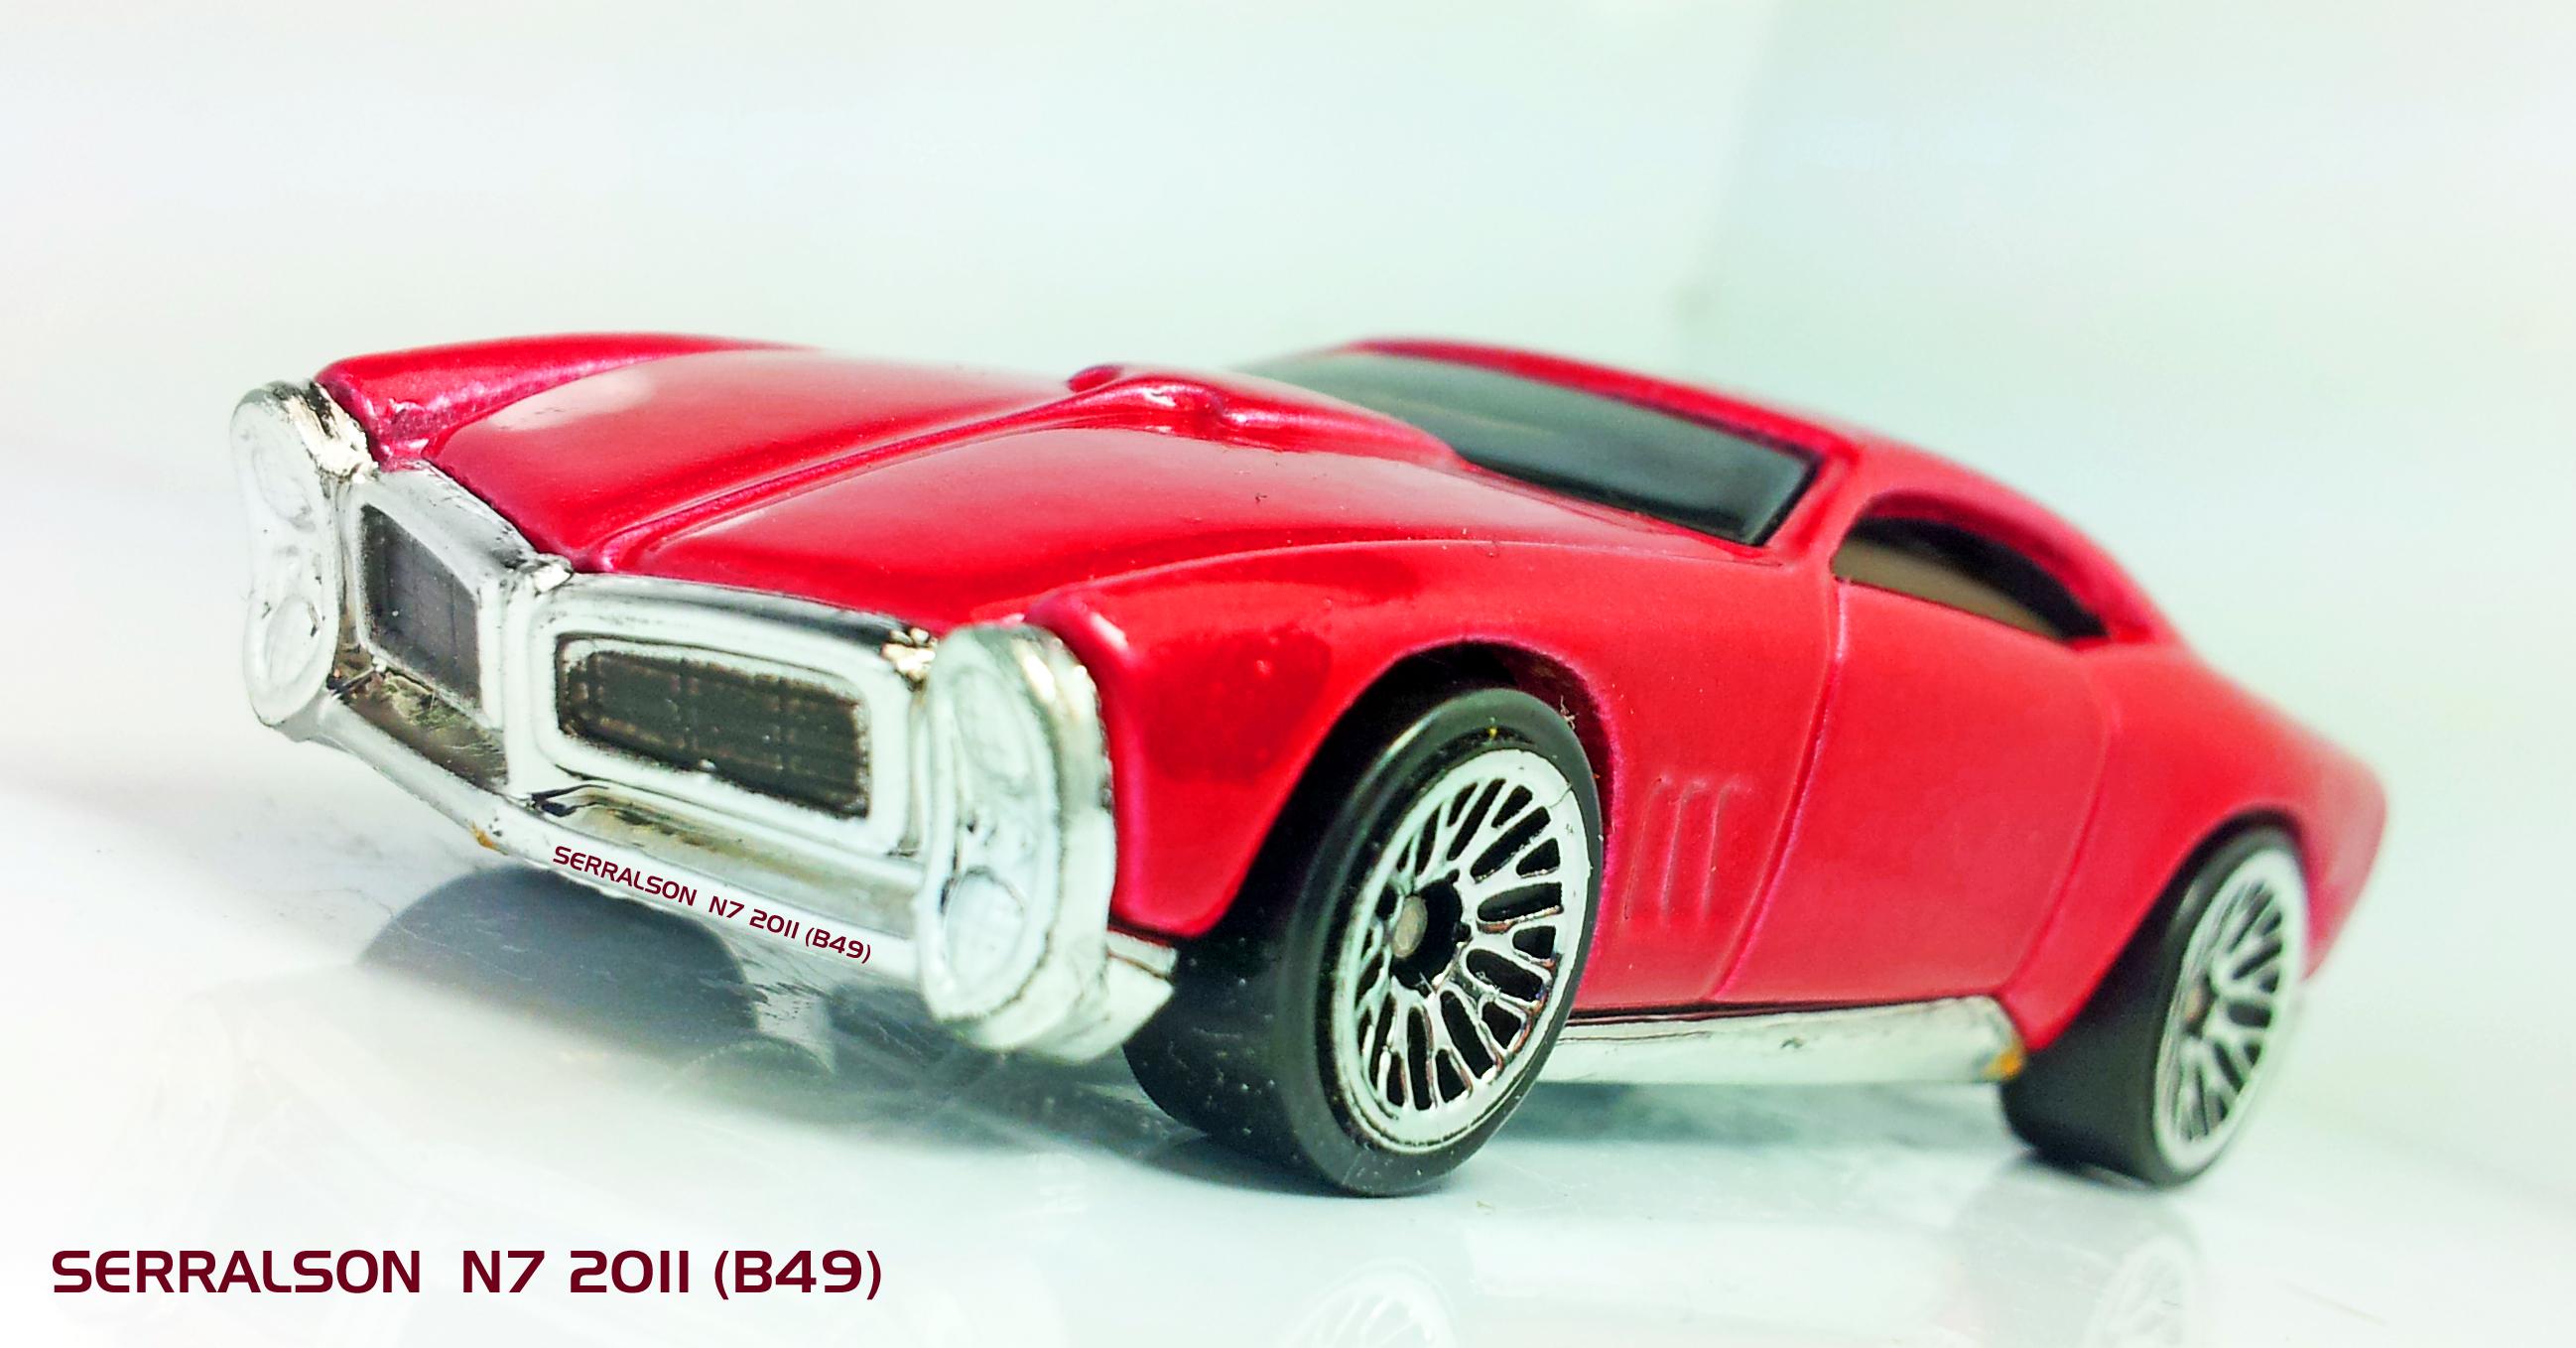 GT-03